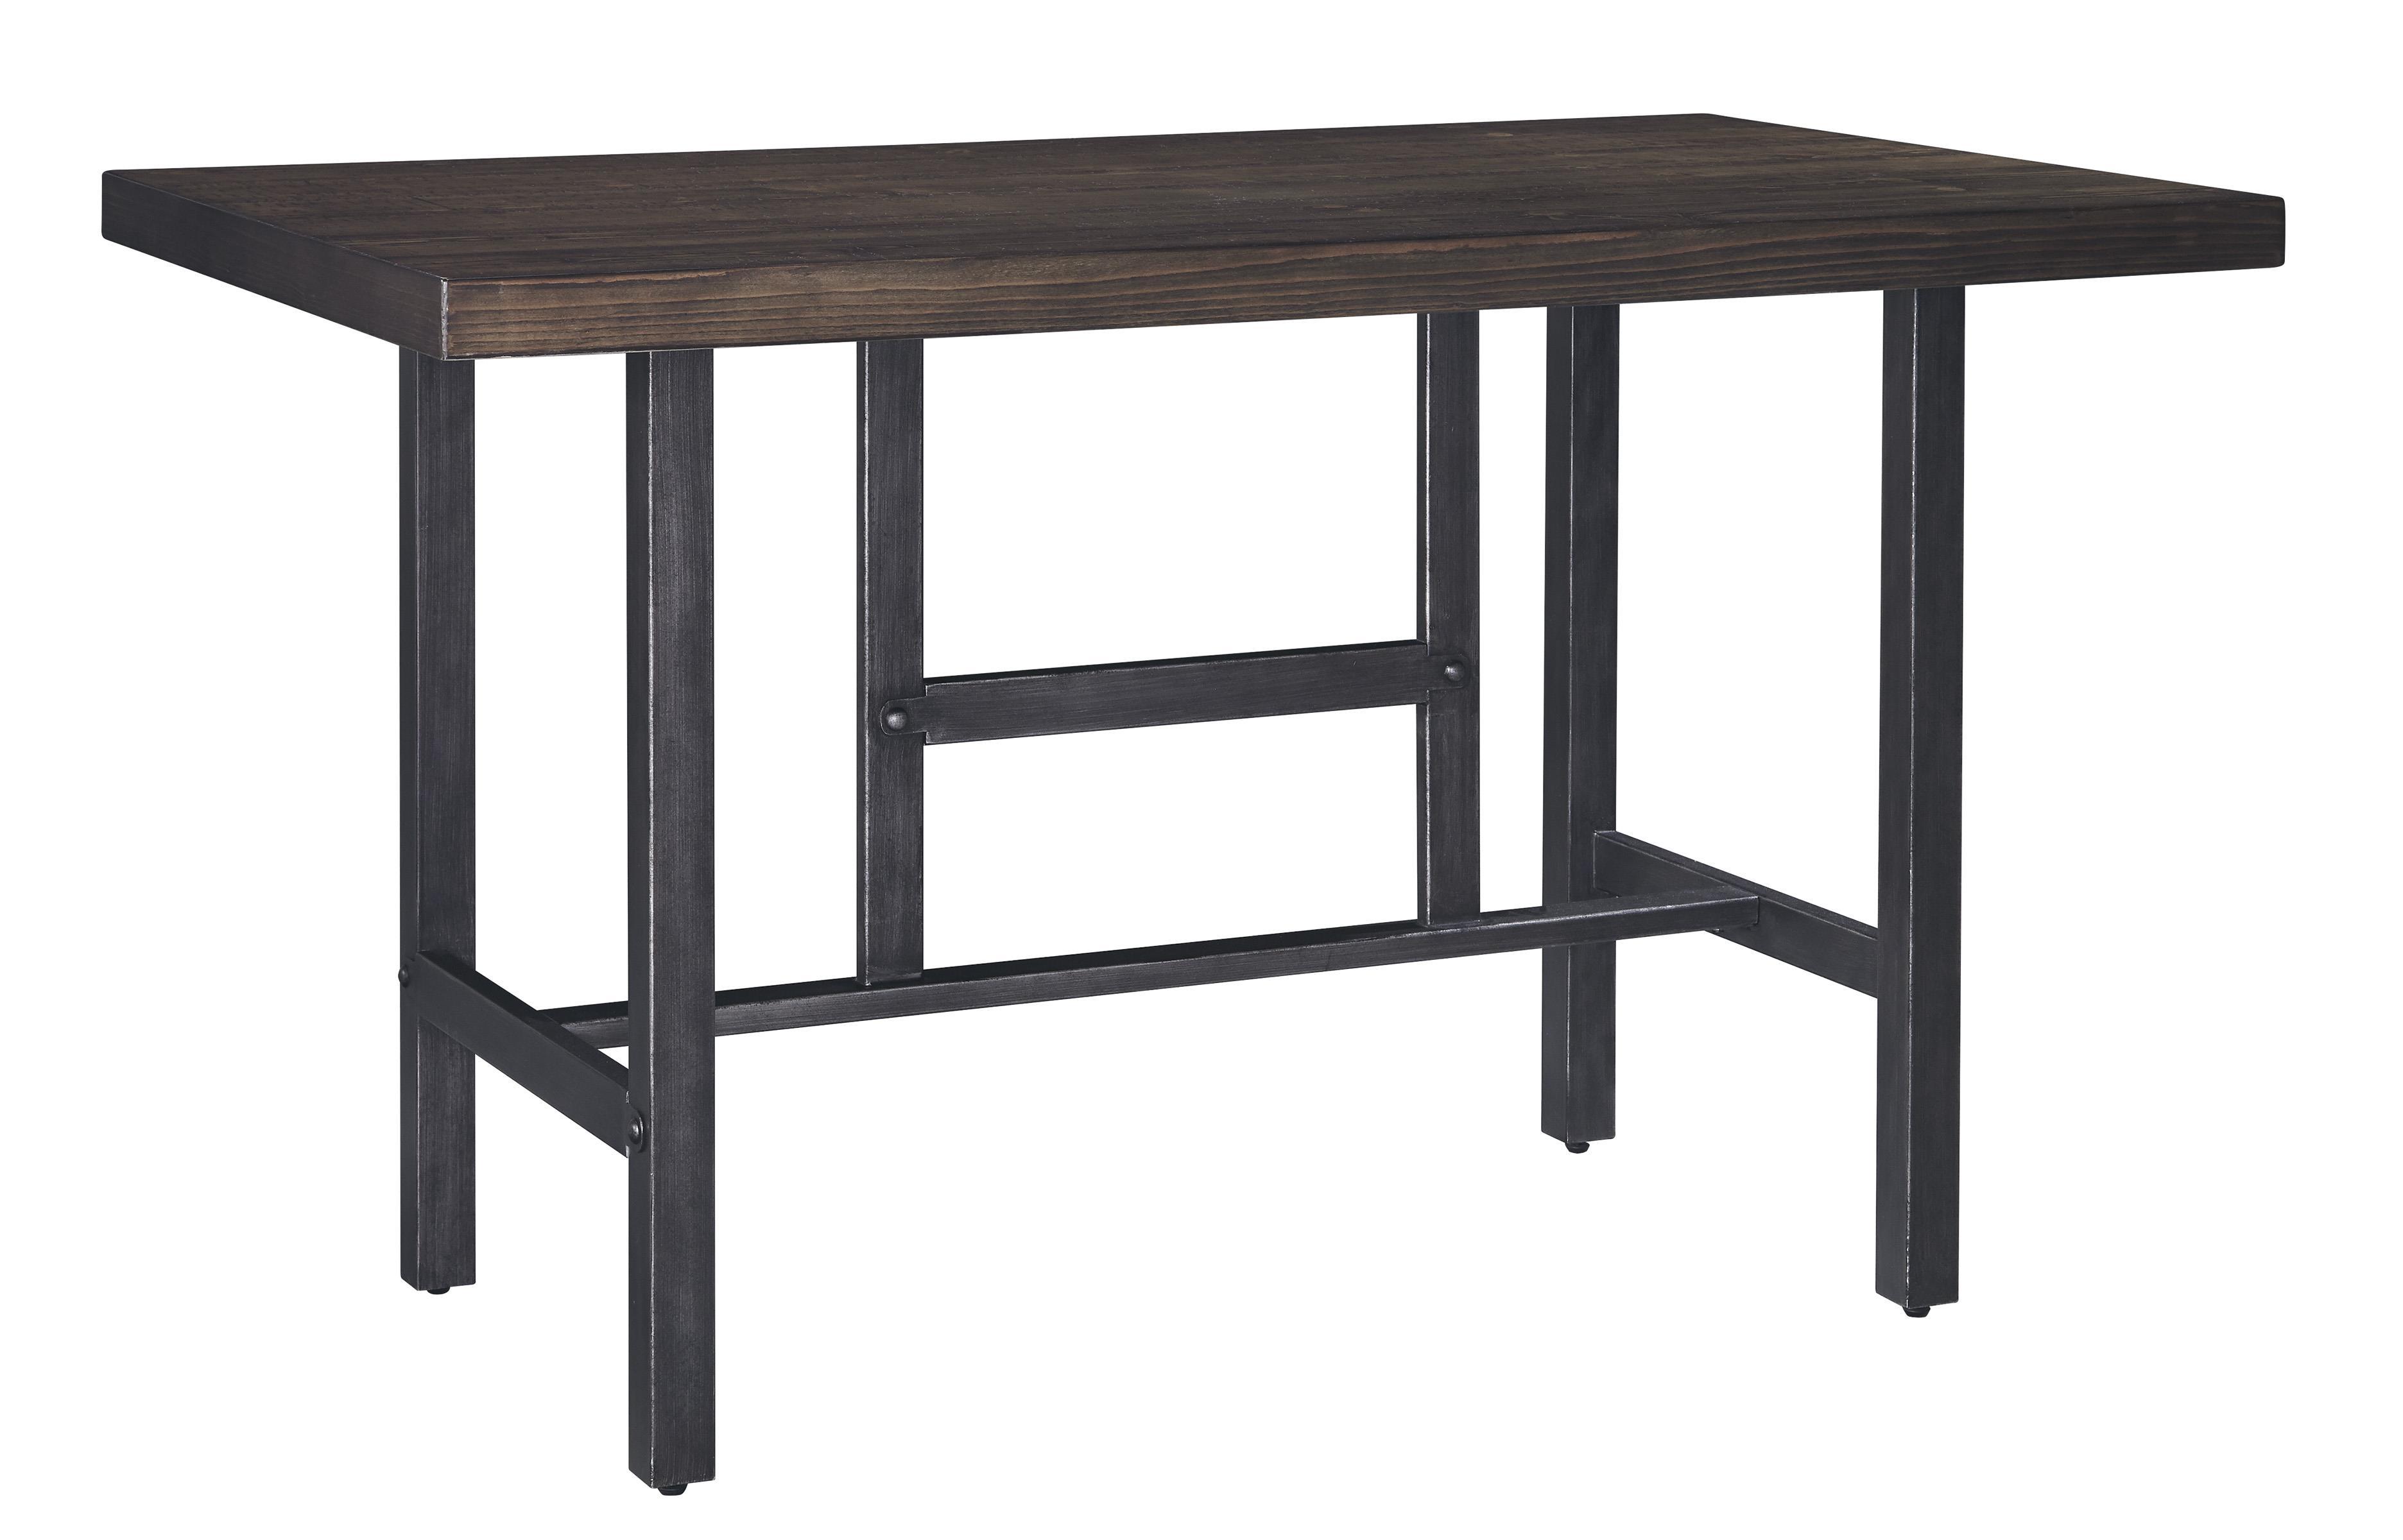 Kavara Rectangular Dining Room Counter Table  by Ashley (Signature Design) at Johnny Janosik